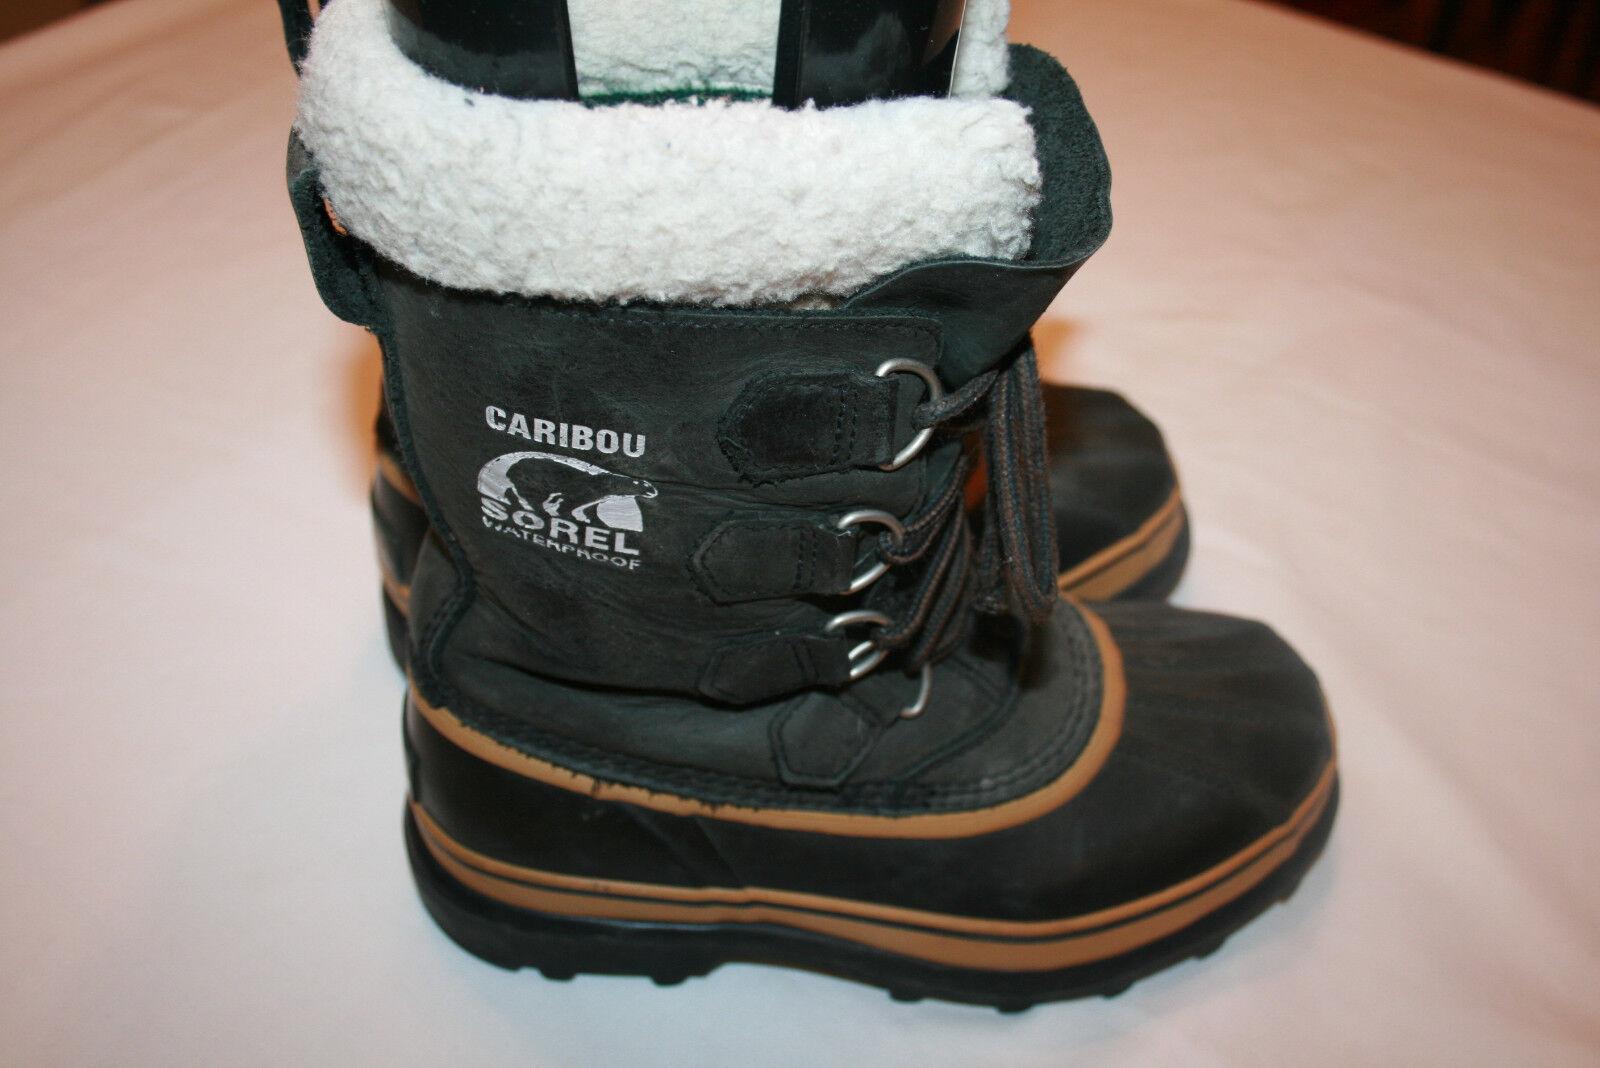 Sorel NL1005-011 Caribou Women's Snow Boot Sz USA 6 Euro 37